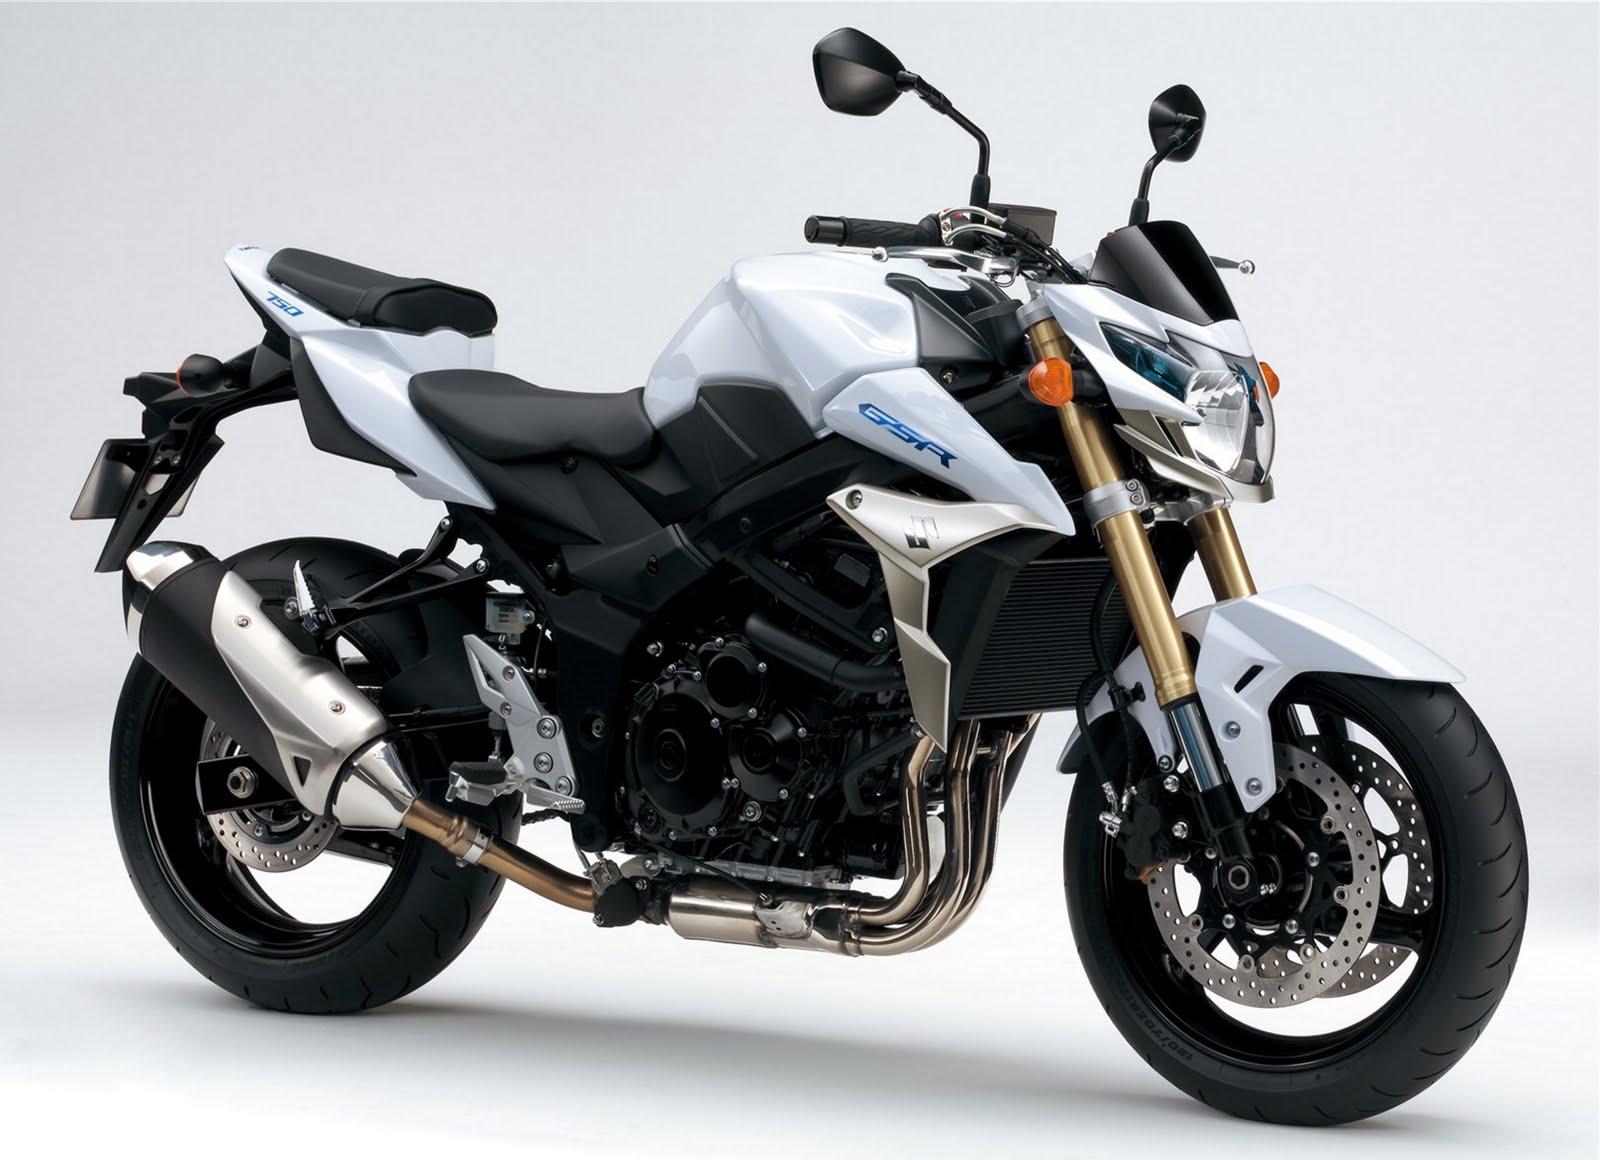 20112BSuzuki2BGSR7502BSportbike252C2Ba